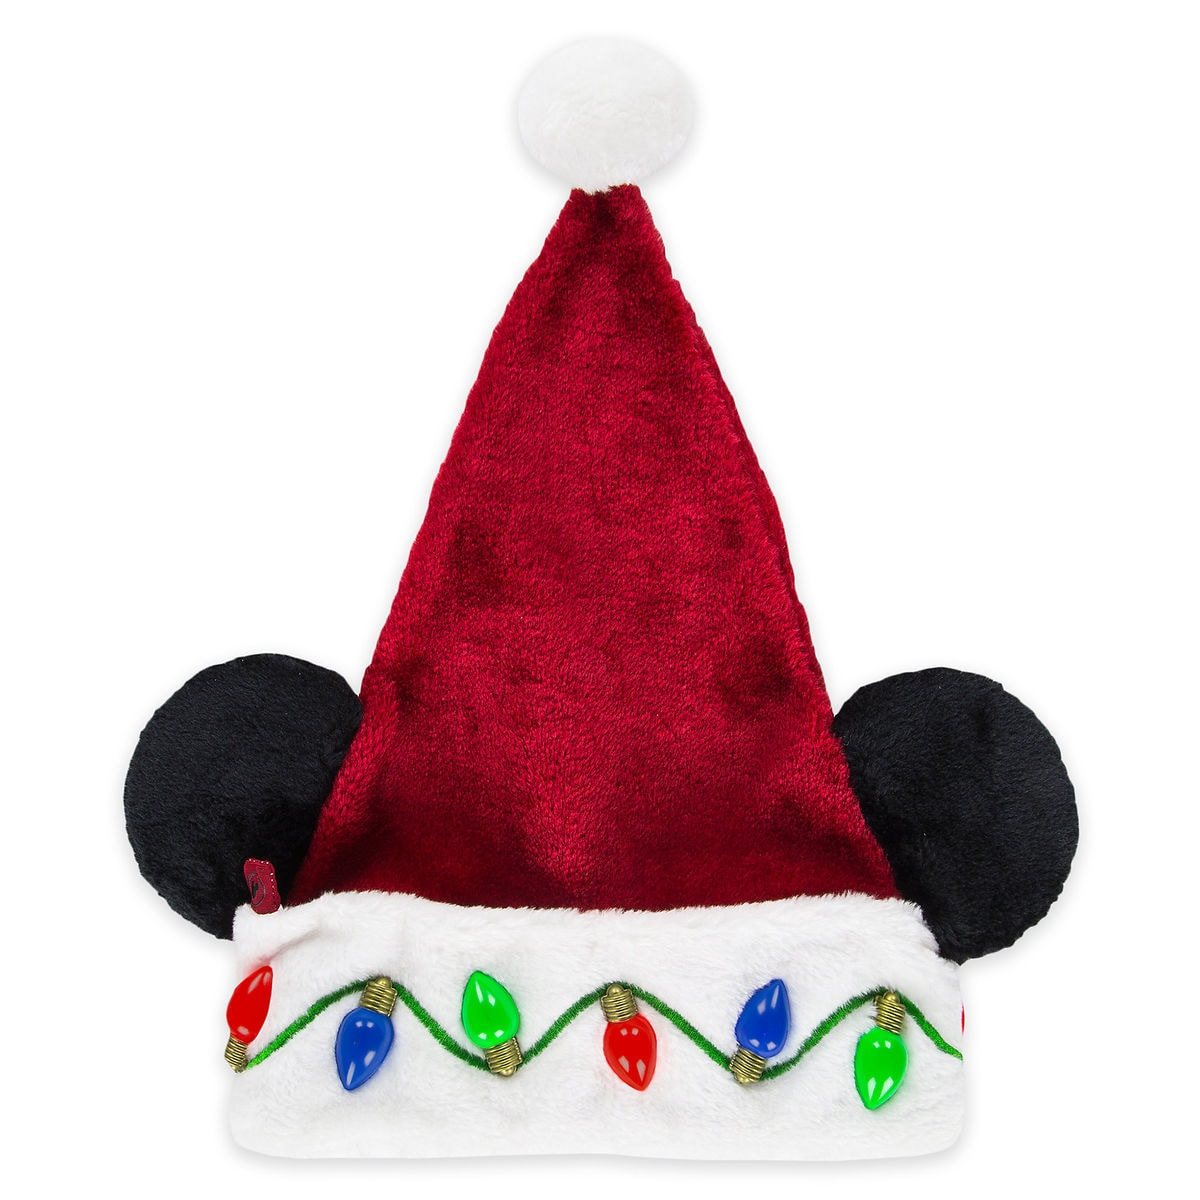 Mickey mouse light up santa hat adults shopdisney product image of mickey mouse light up santa hat adults 1 maxwellsz